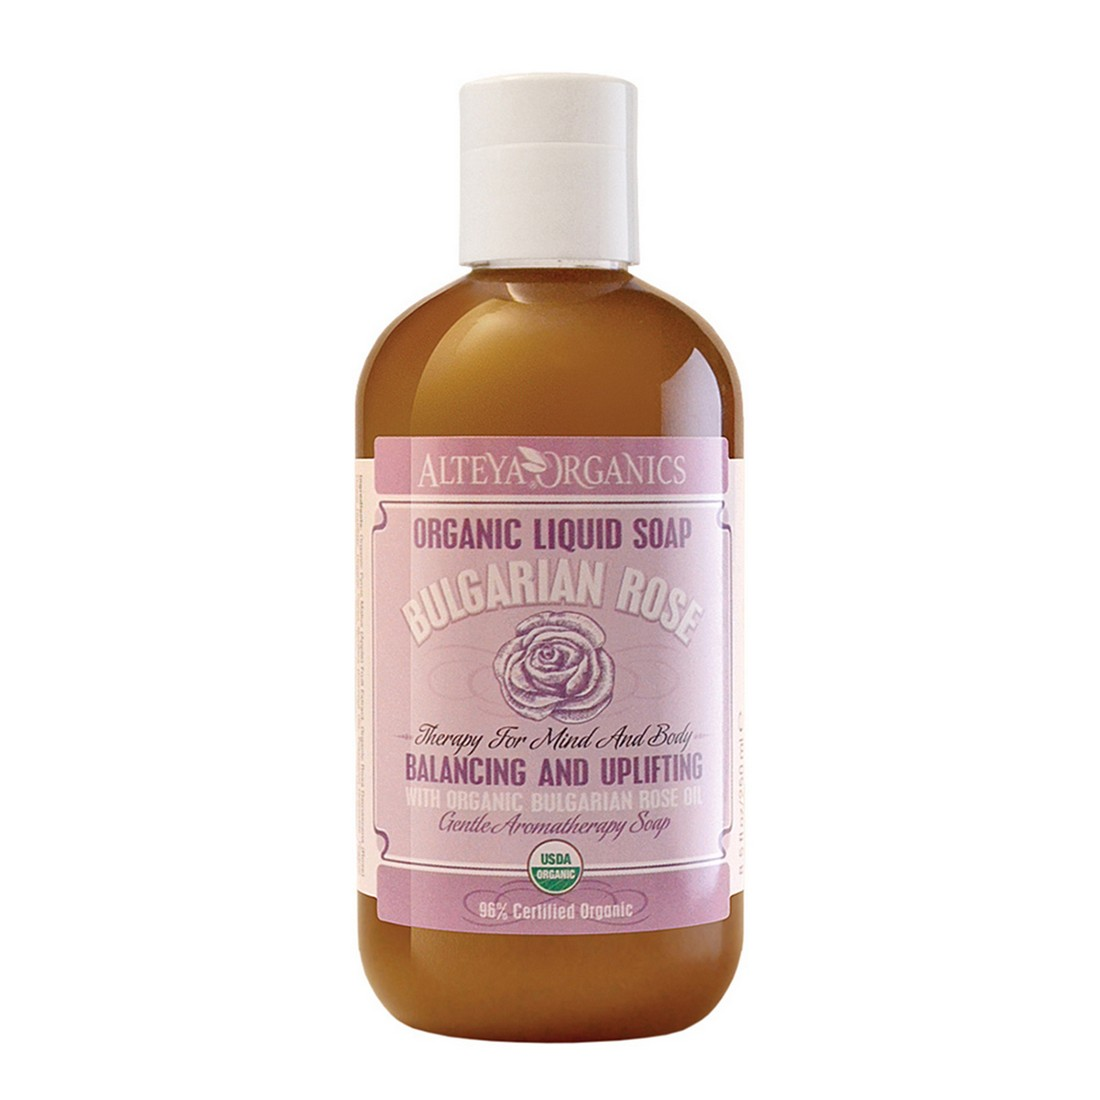 Bio organic liquid soap for hands and body with Bulgarian rose oil Alteya Organics